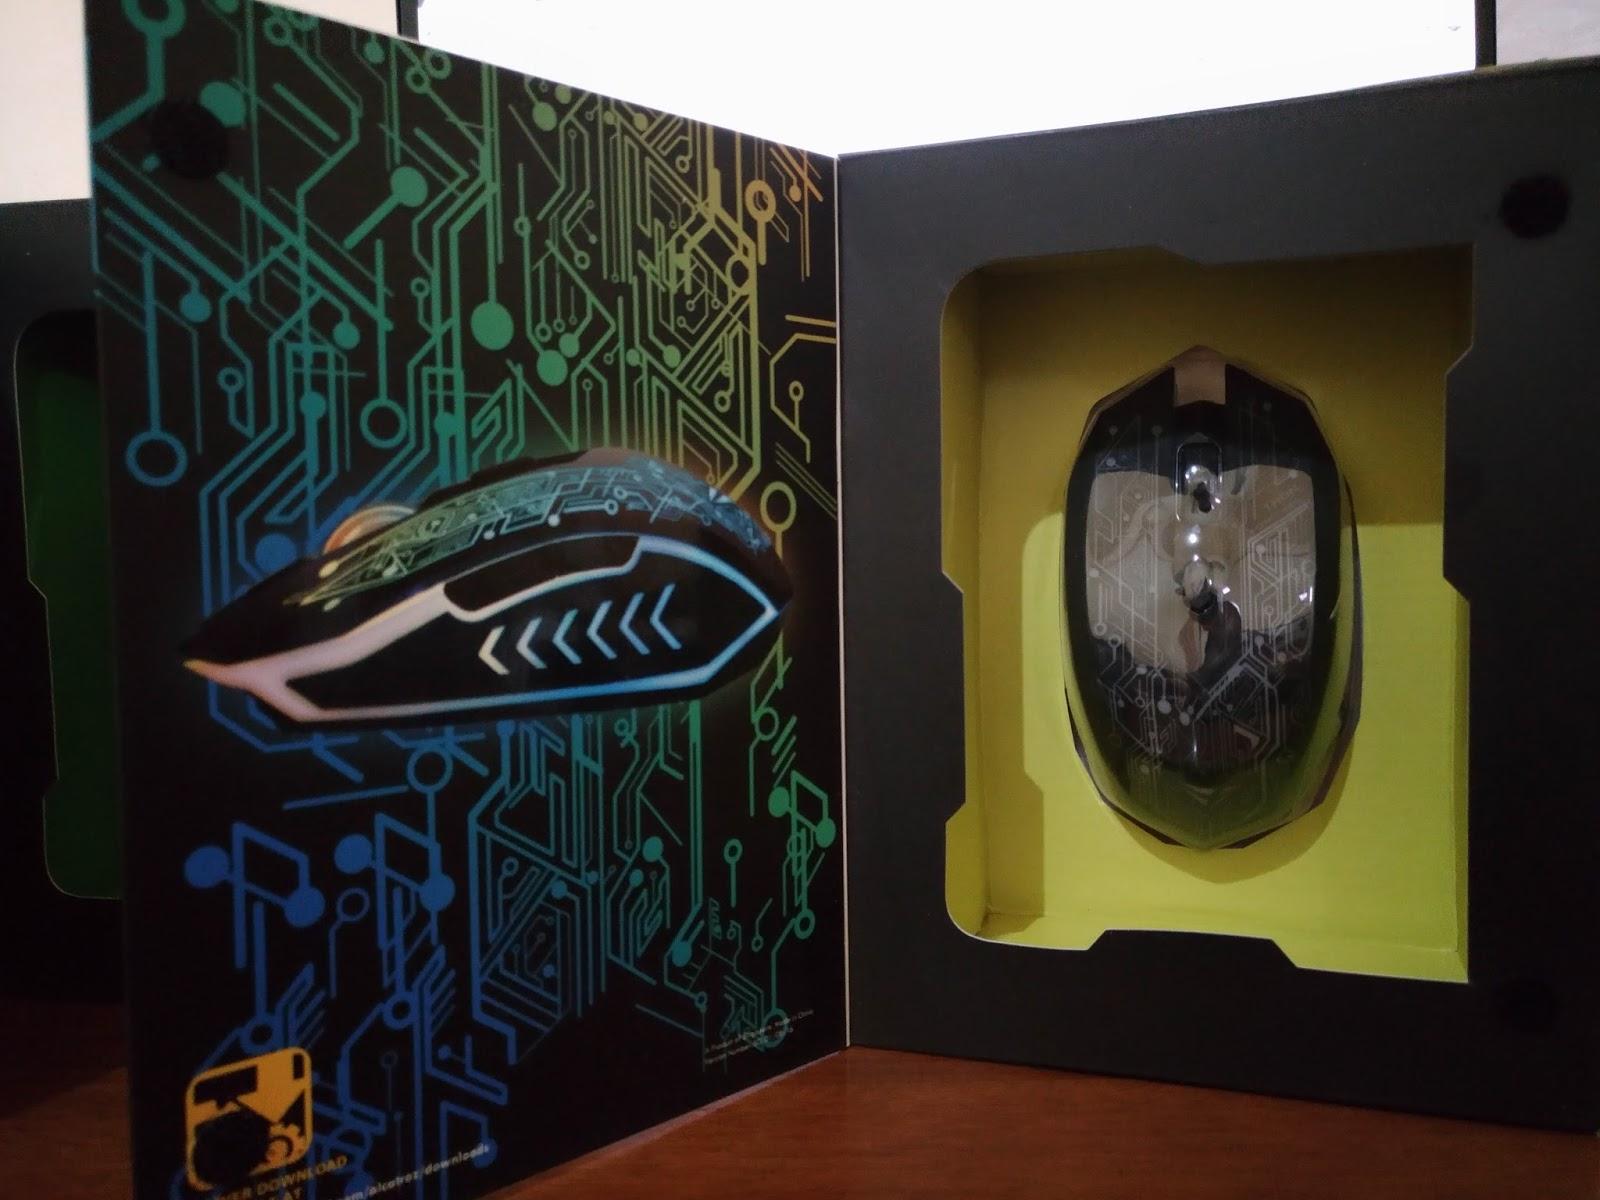 Gaming Mouse Baru dari Alcatroz X-Craft Air Series (Wireless)